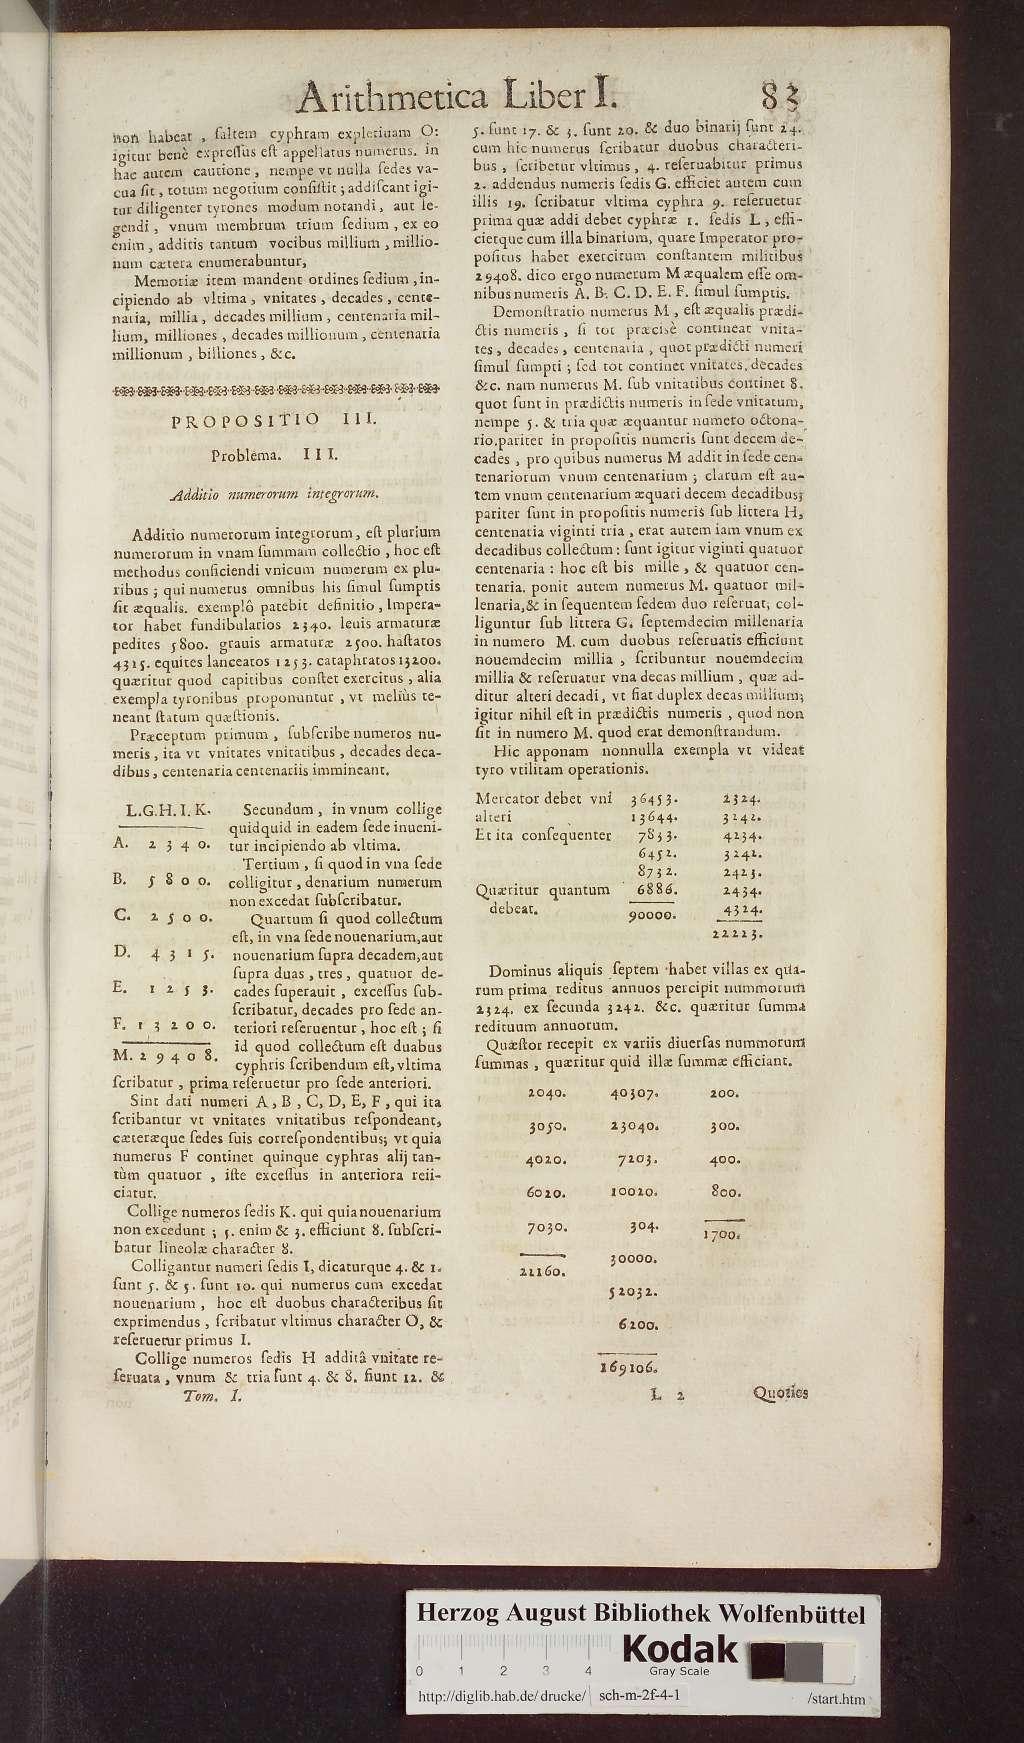 http://diglib.hab.de/drucke/sch-m-2f-4-1/00127.jpg